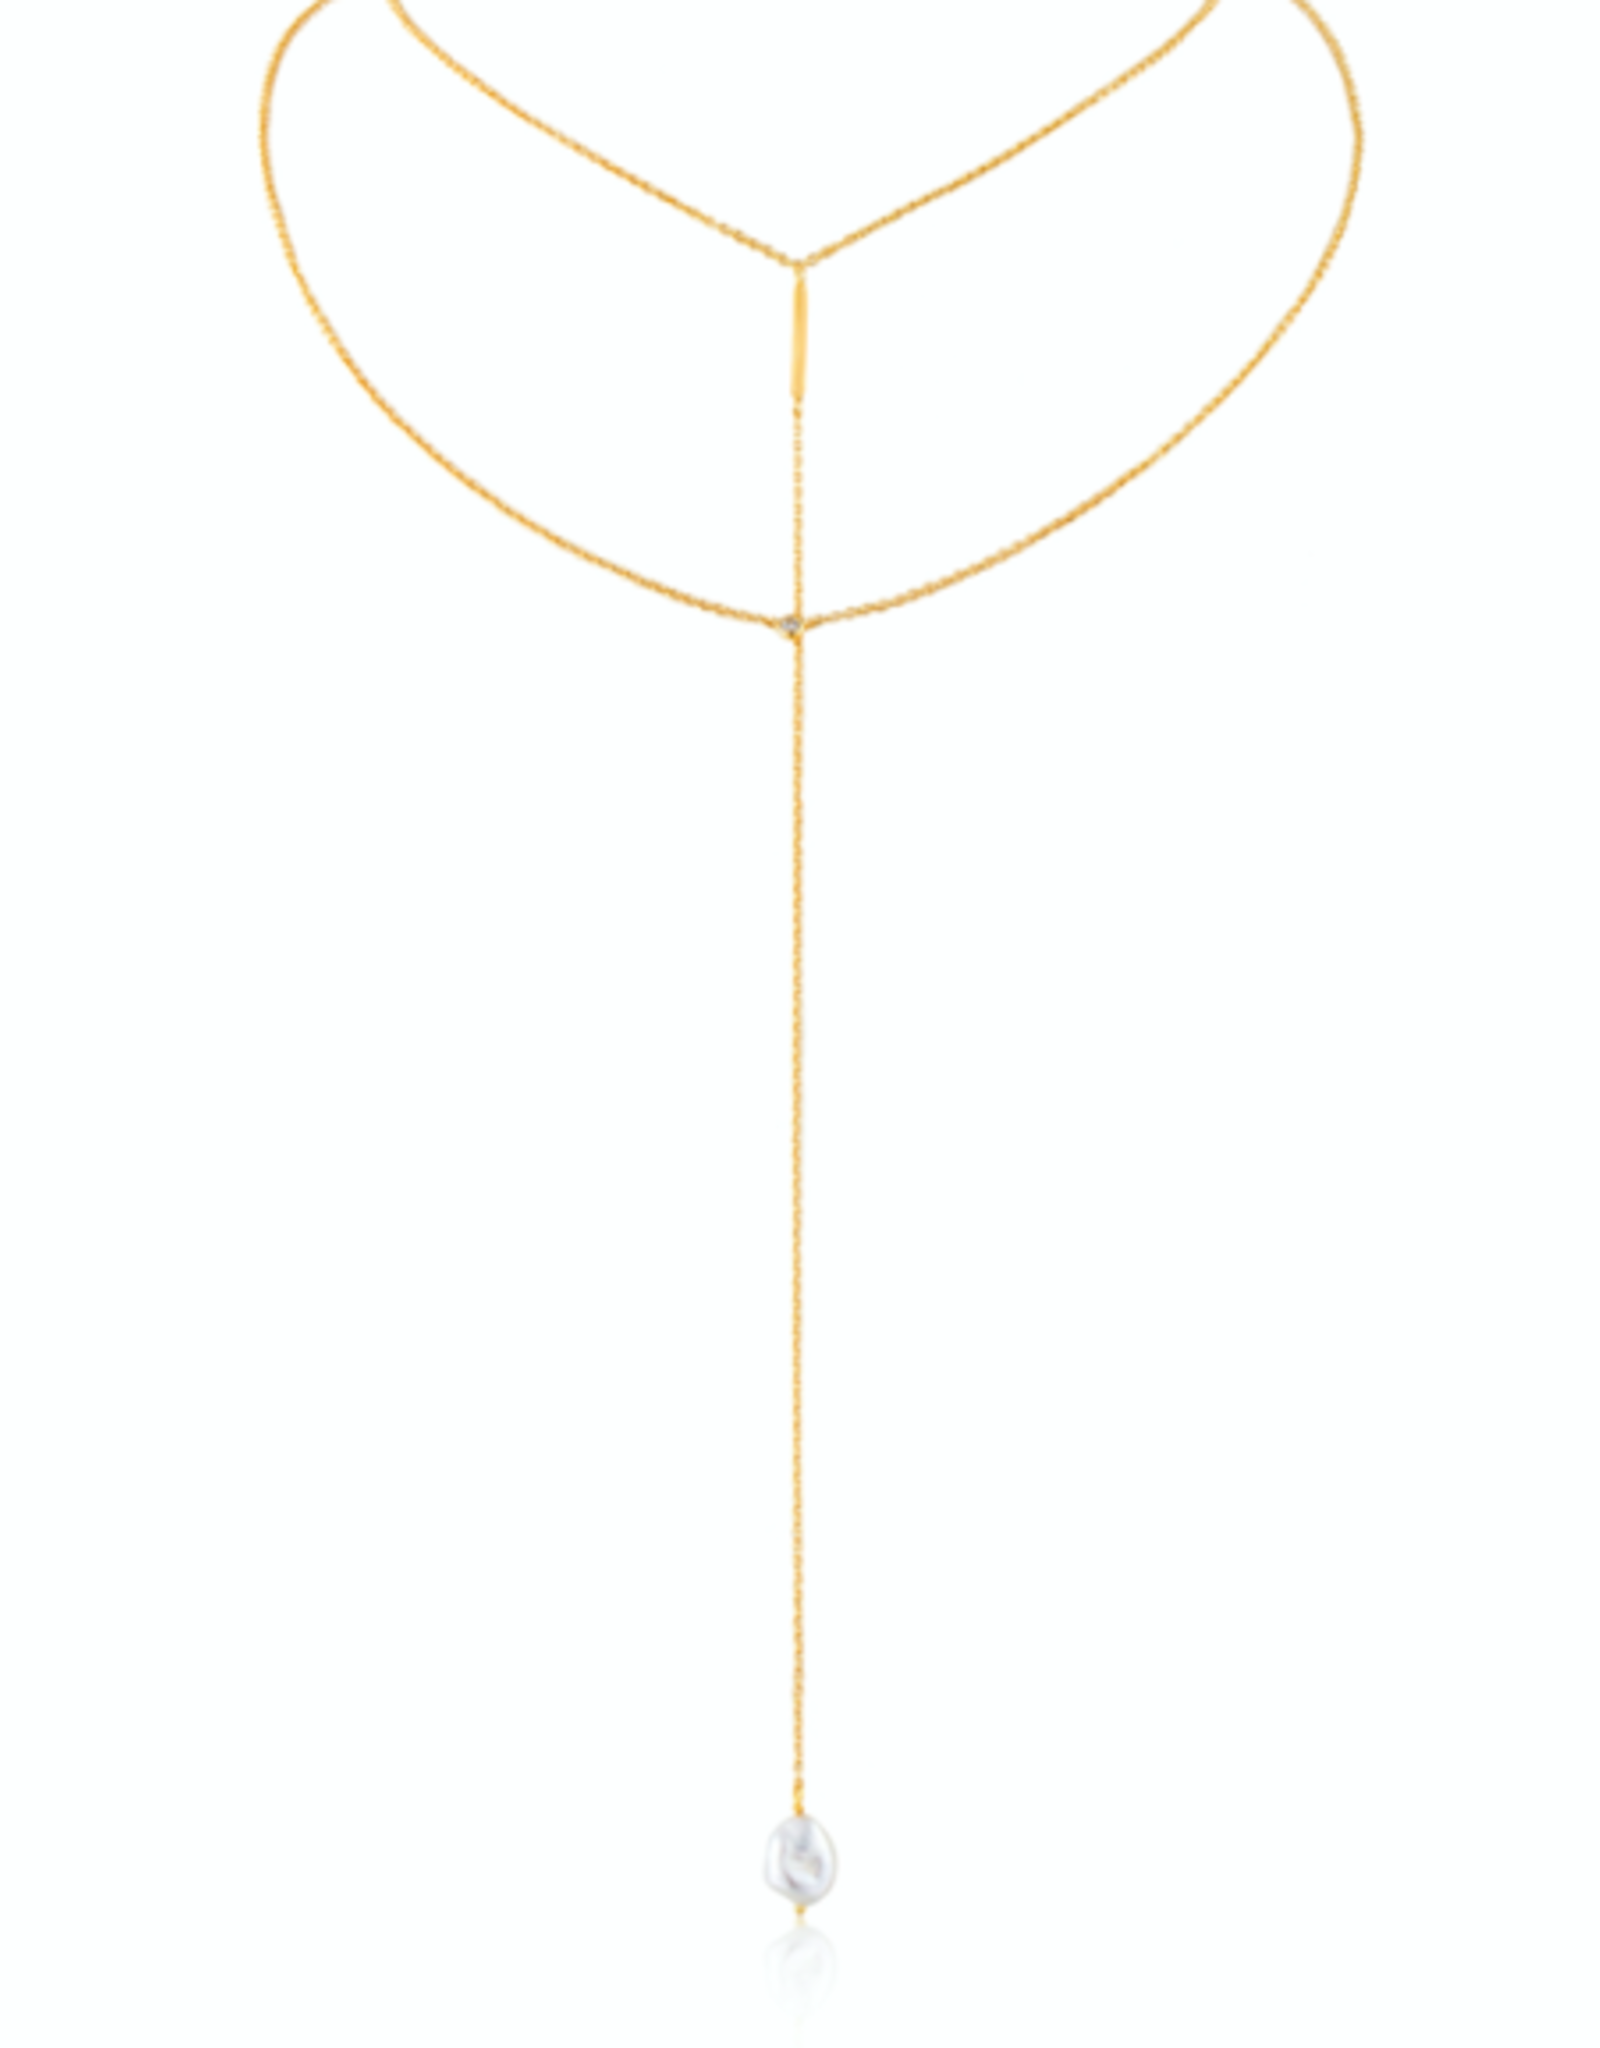 Ania Haie Ania Haie - pearl y necklace gold